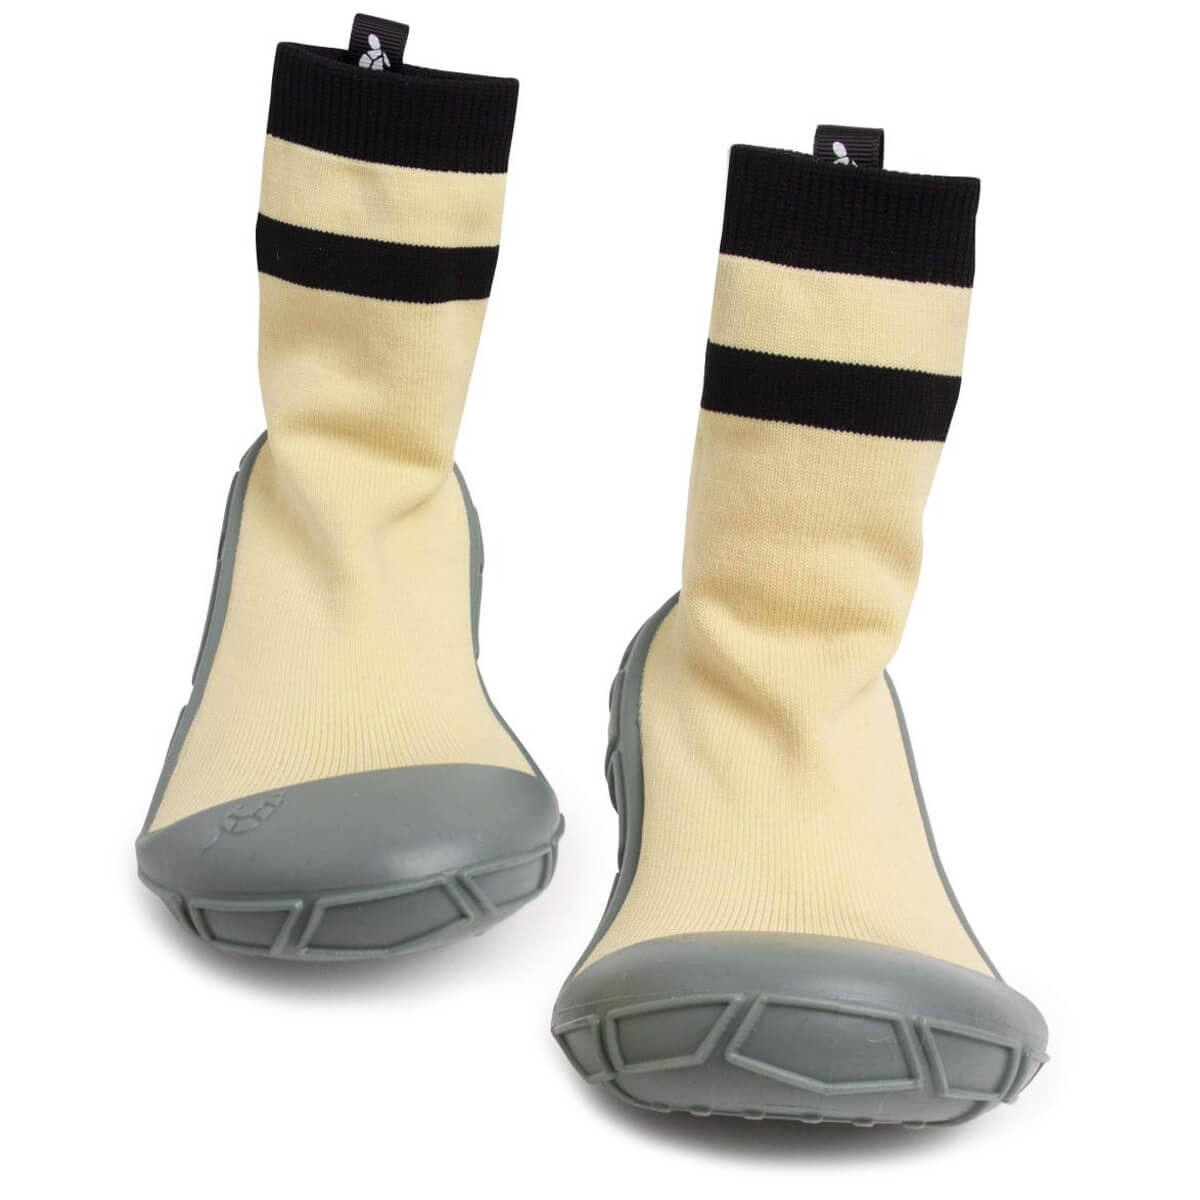 "Turtl Sockenschuh ""Socks in a Shell"" gelb"